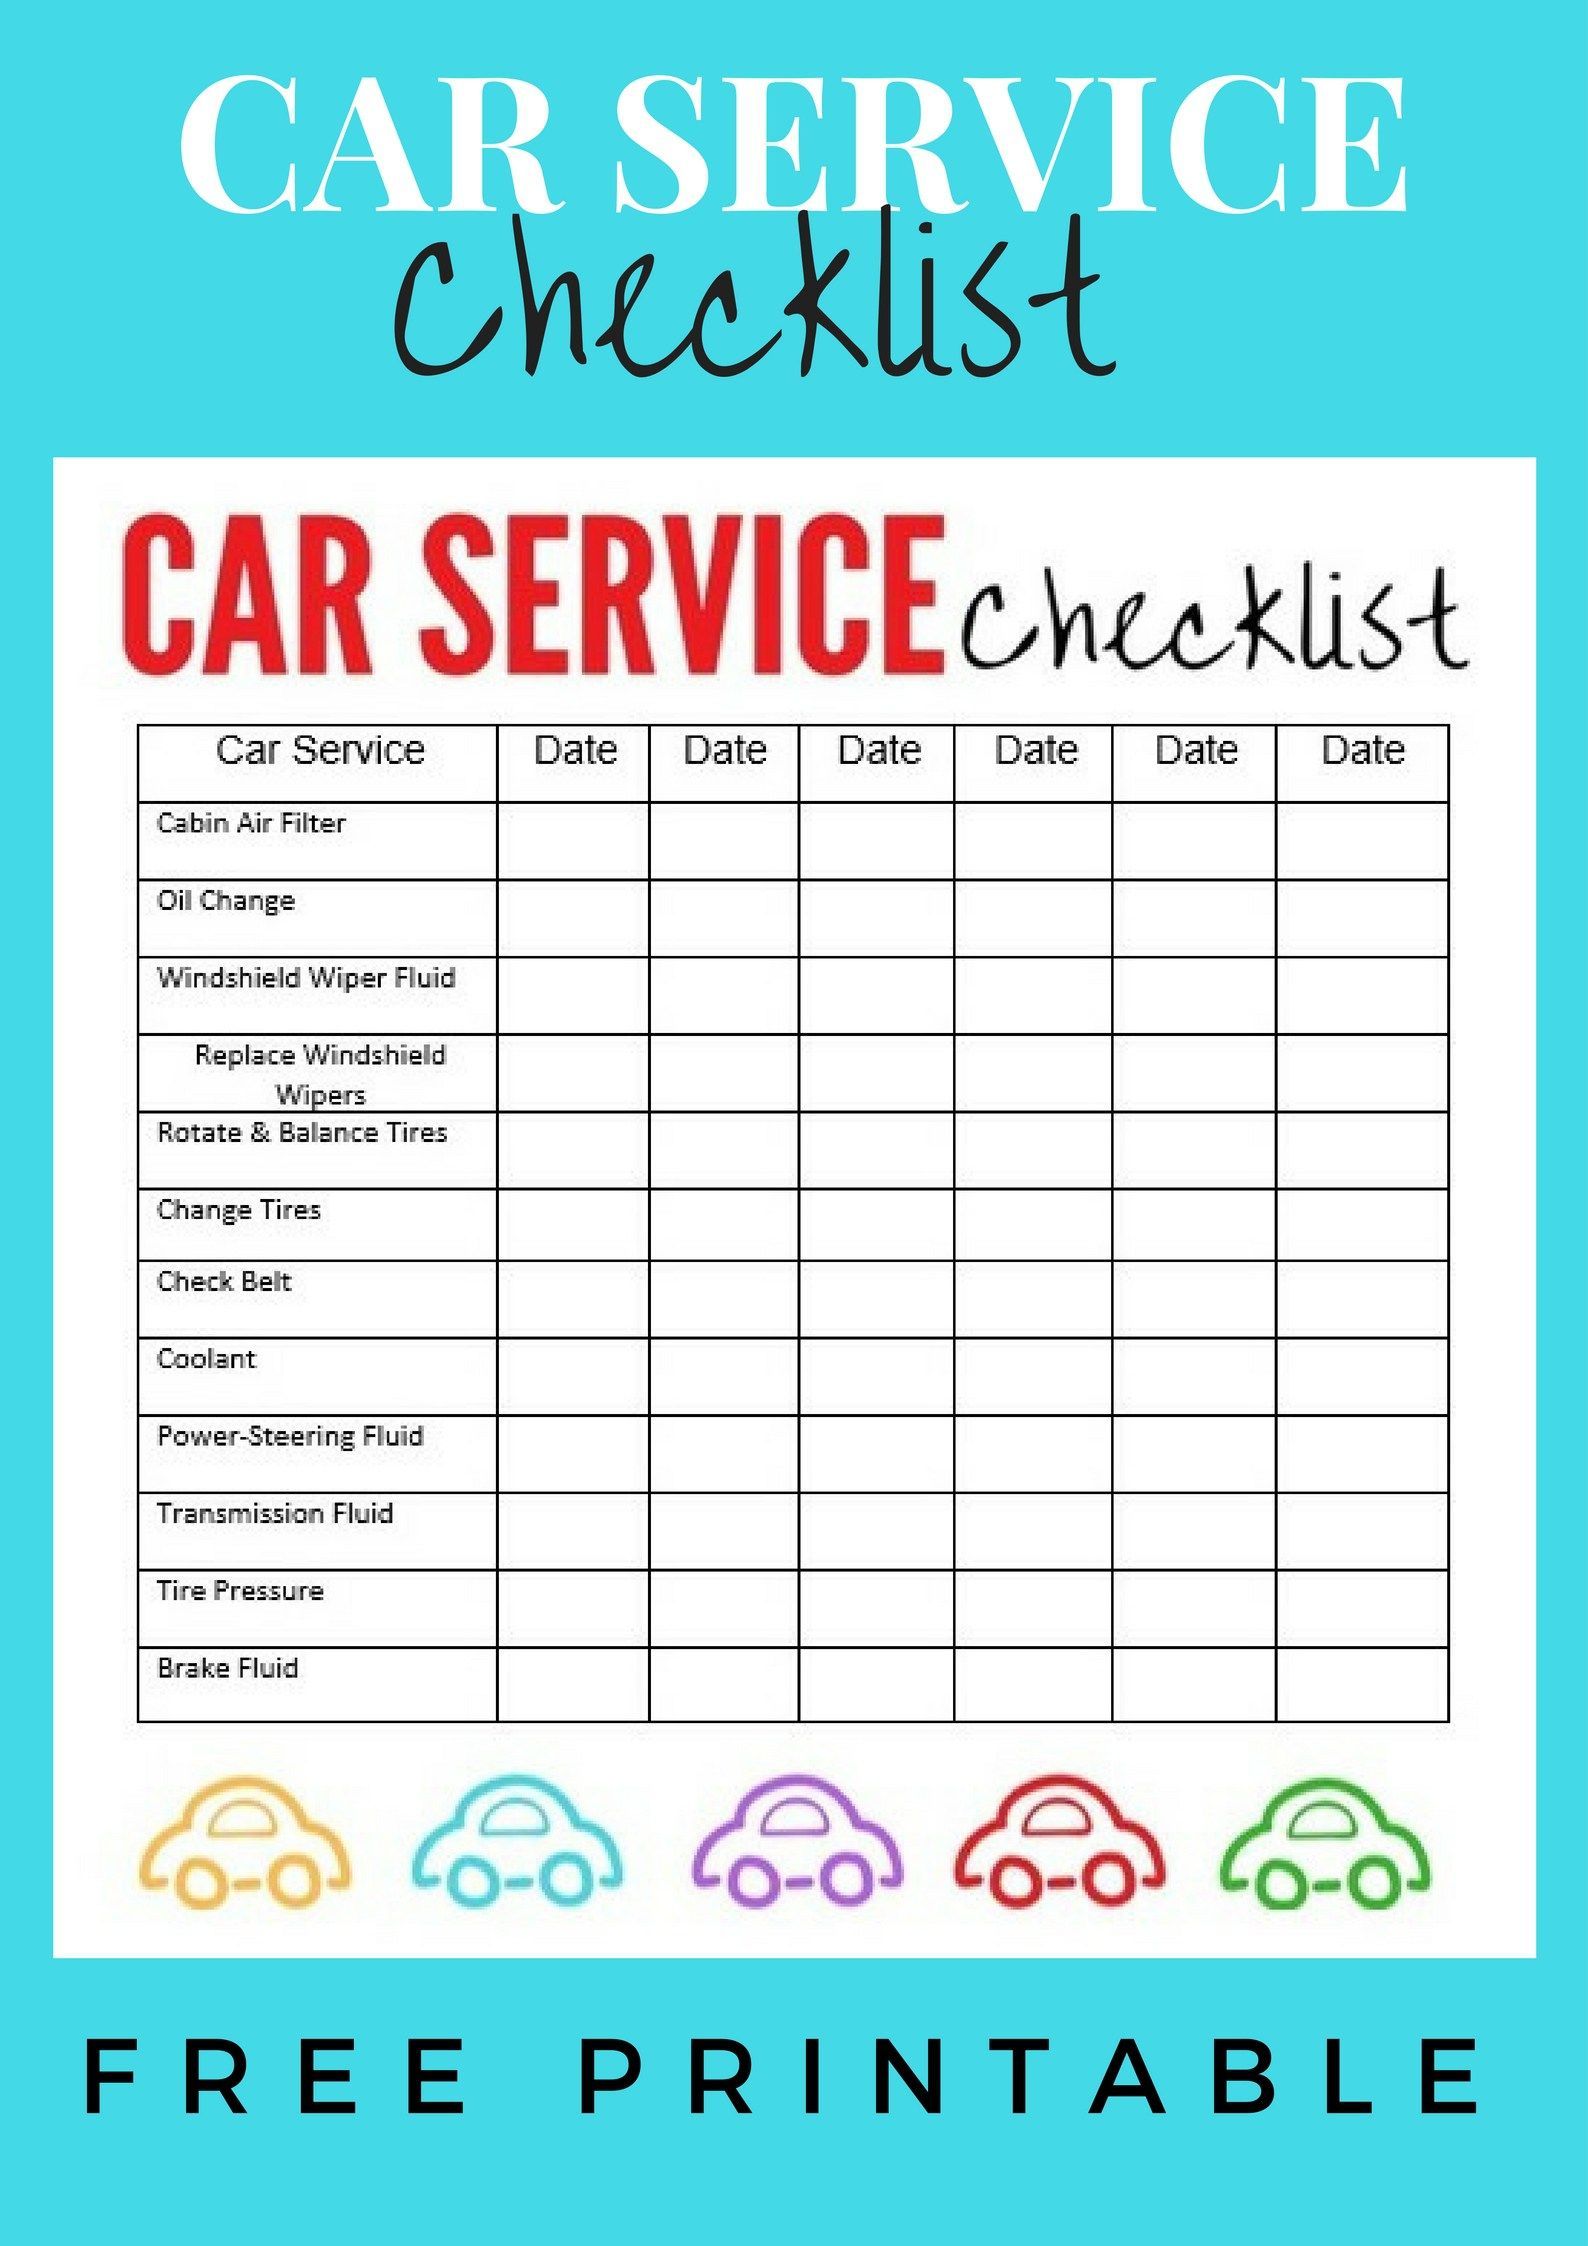 Car Service Checklist Car checklist, Car hacks, Free